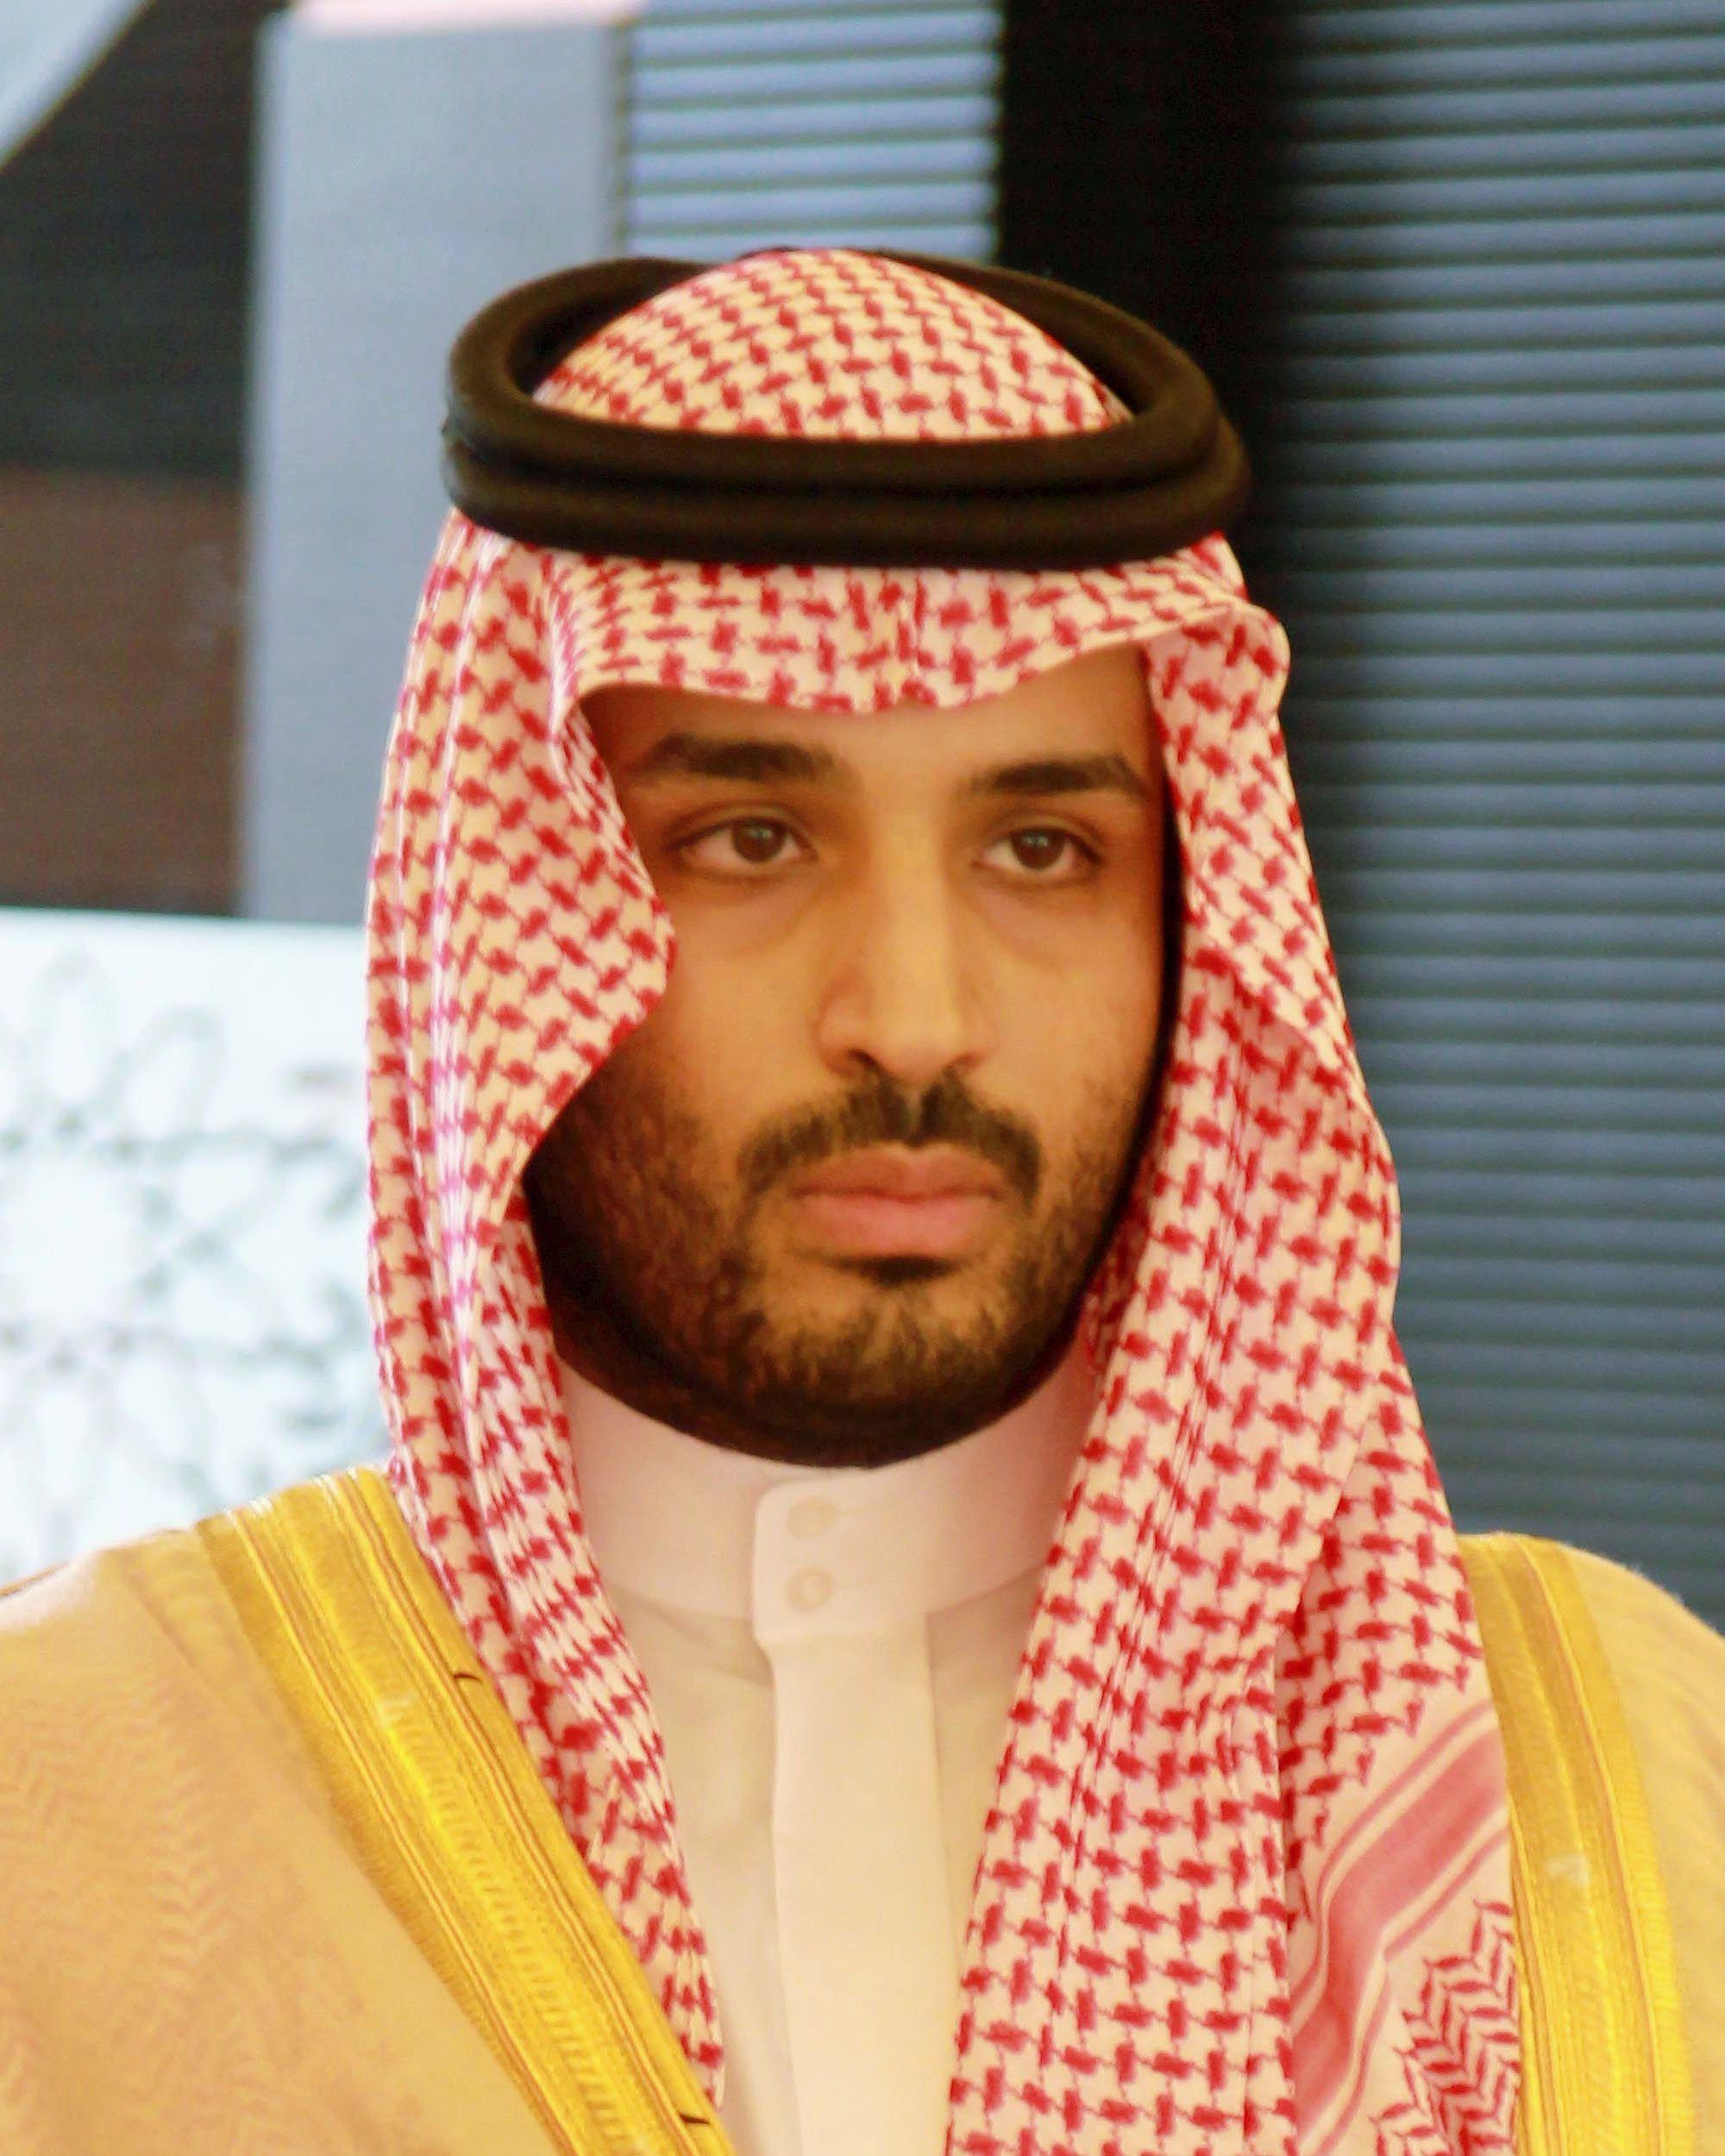 Saudi Arabia Travel In Unserem Blog Viel Mehr Informationen Https Storelatina Com Saudiarabia Travelling Saudiarabiafood Press Tv The Duff Saudi Arabia